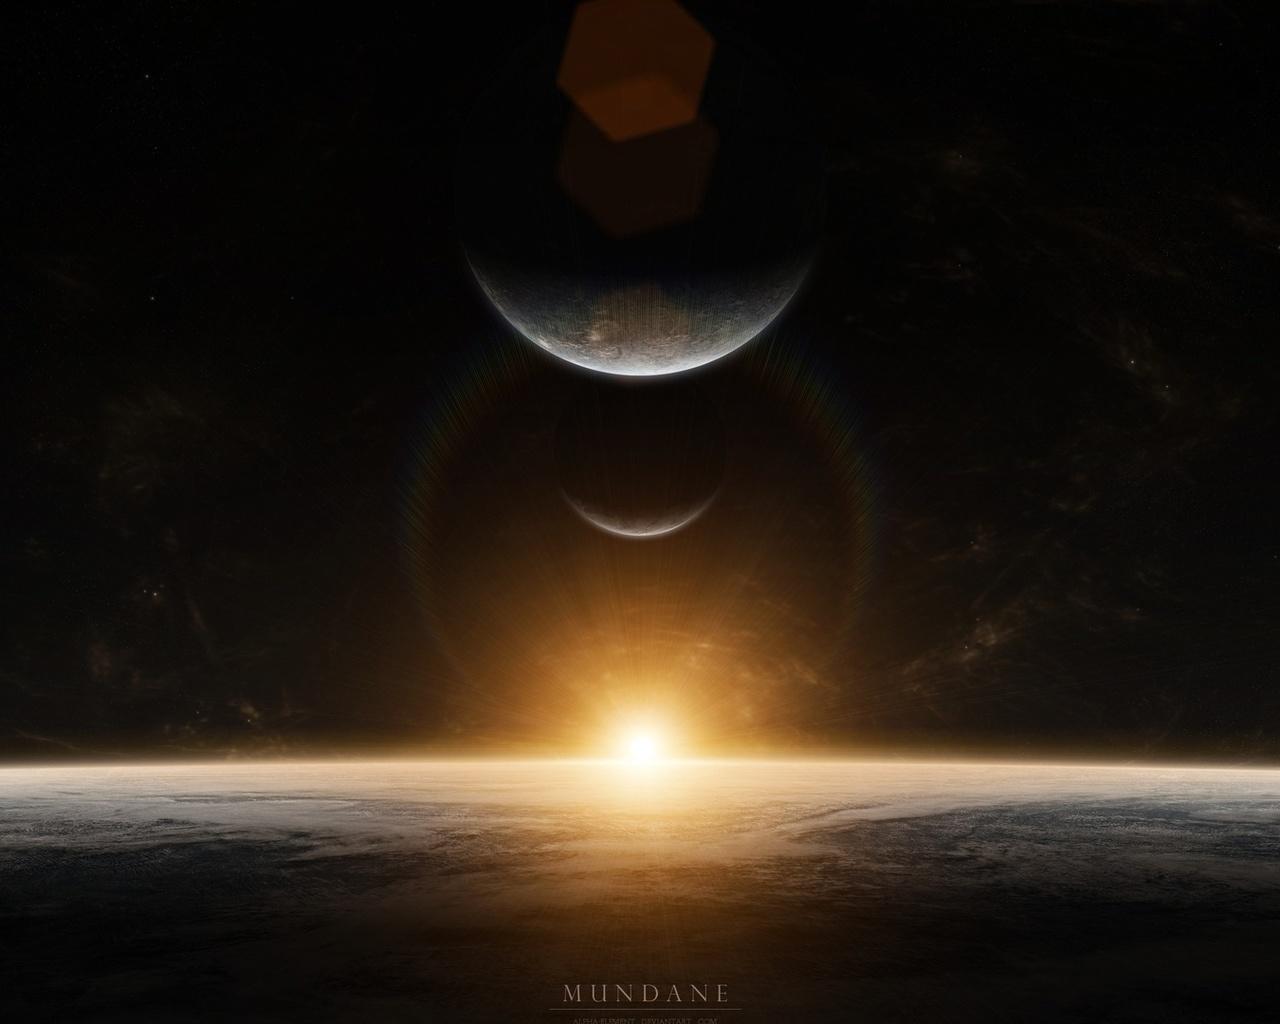 планеты, звезды, восход, sunrise, mundane